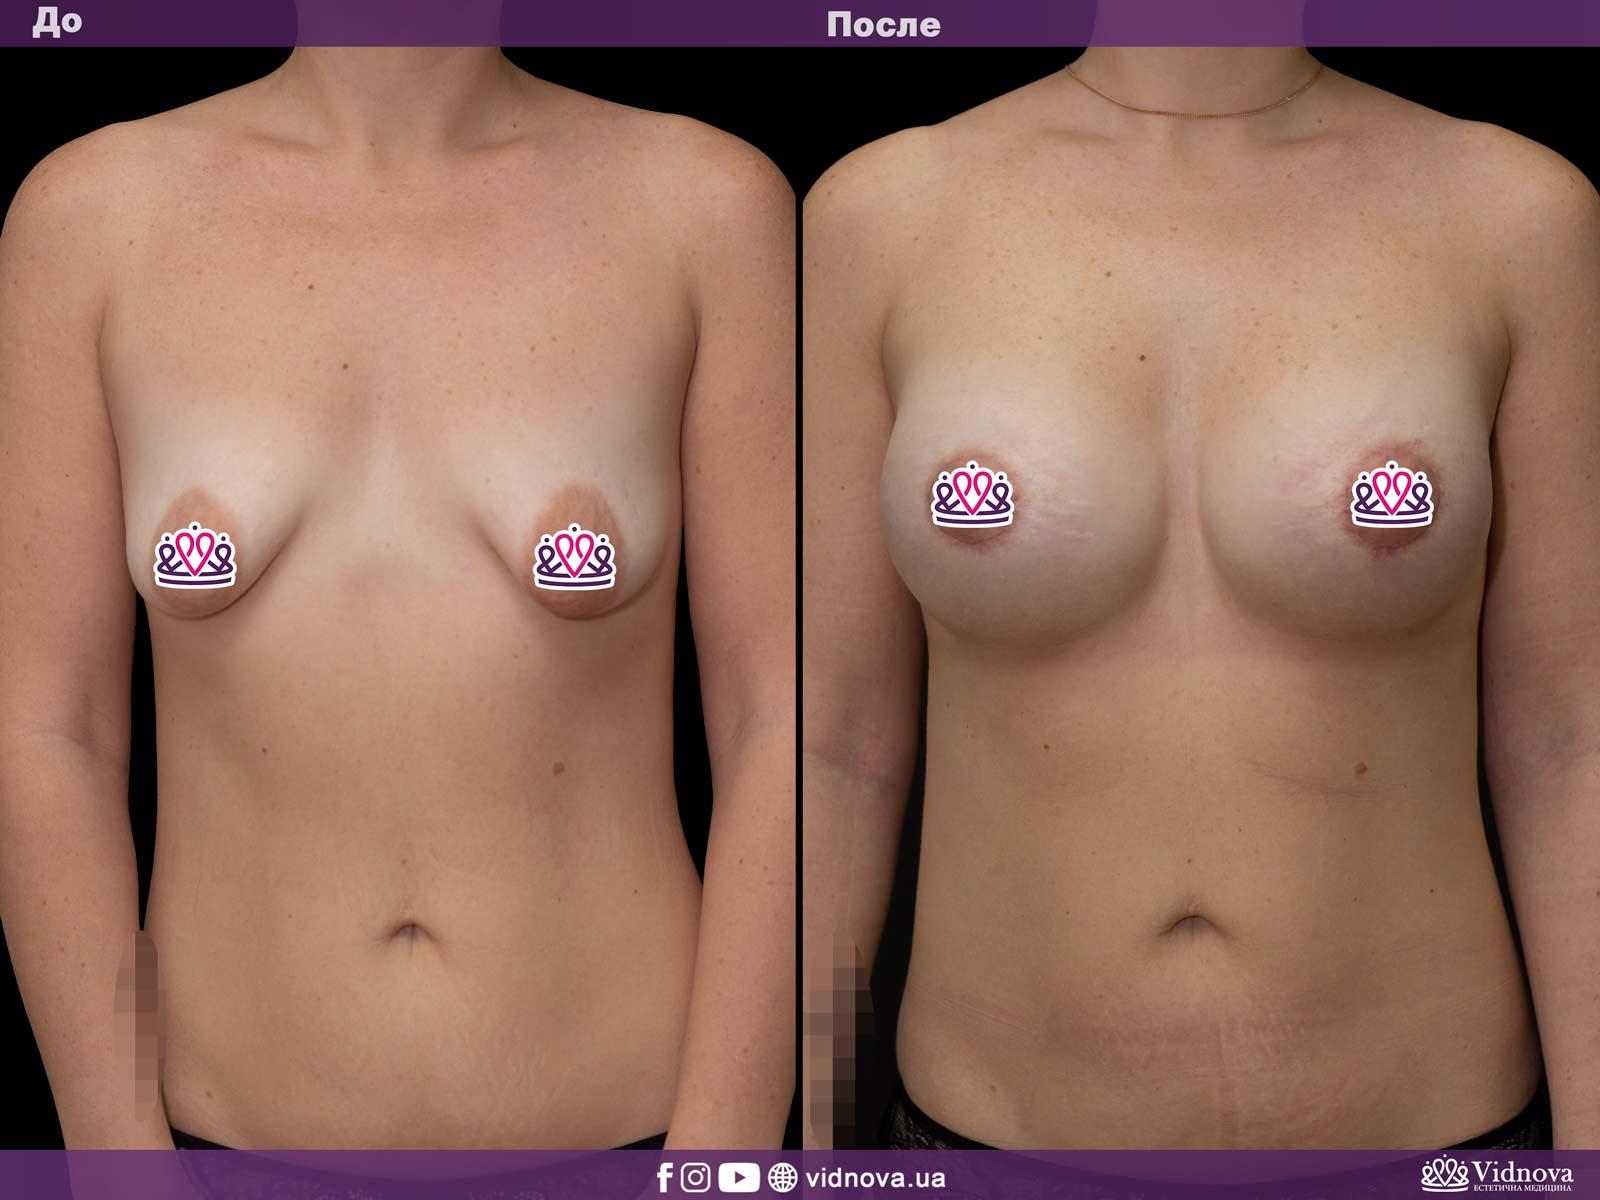 Подтяжка груди: Фото ДО и ПОСЛЕ - Пример №17-1 - Клиника Vidnova